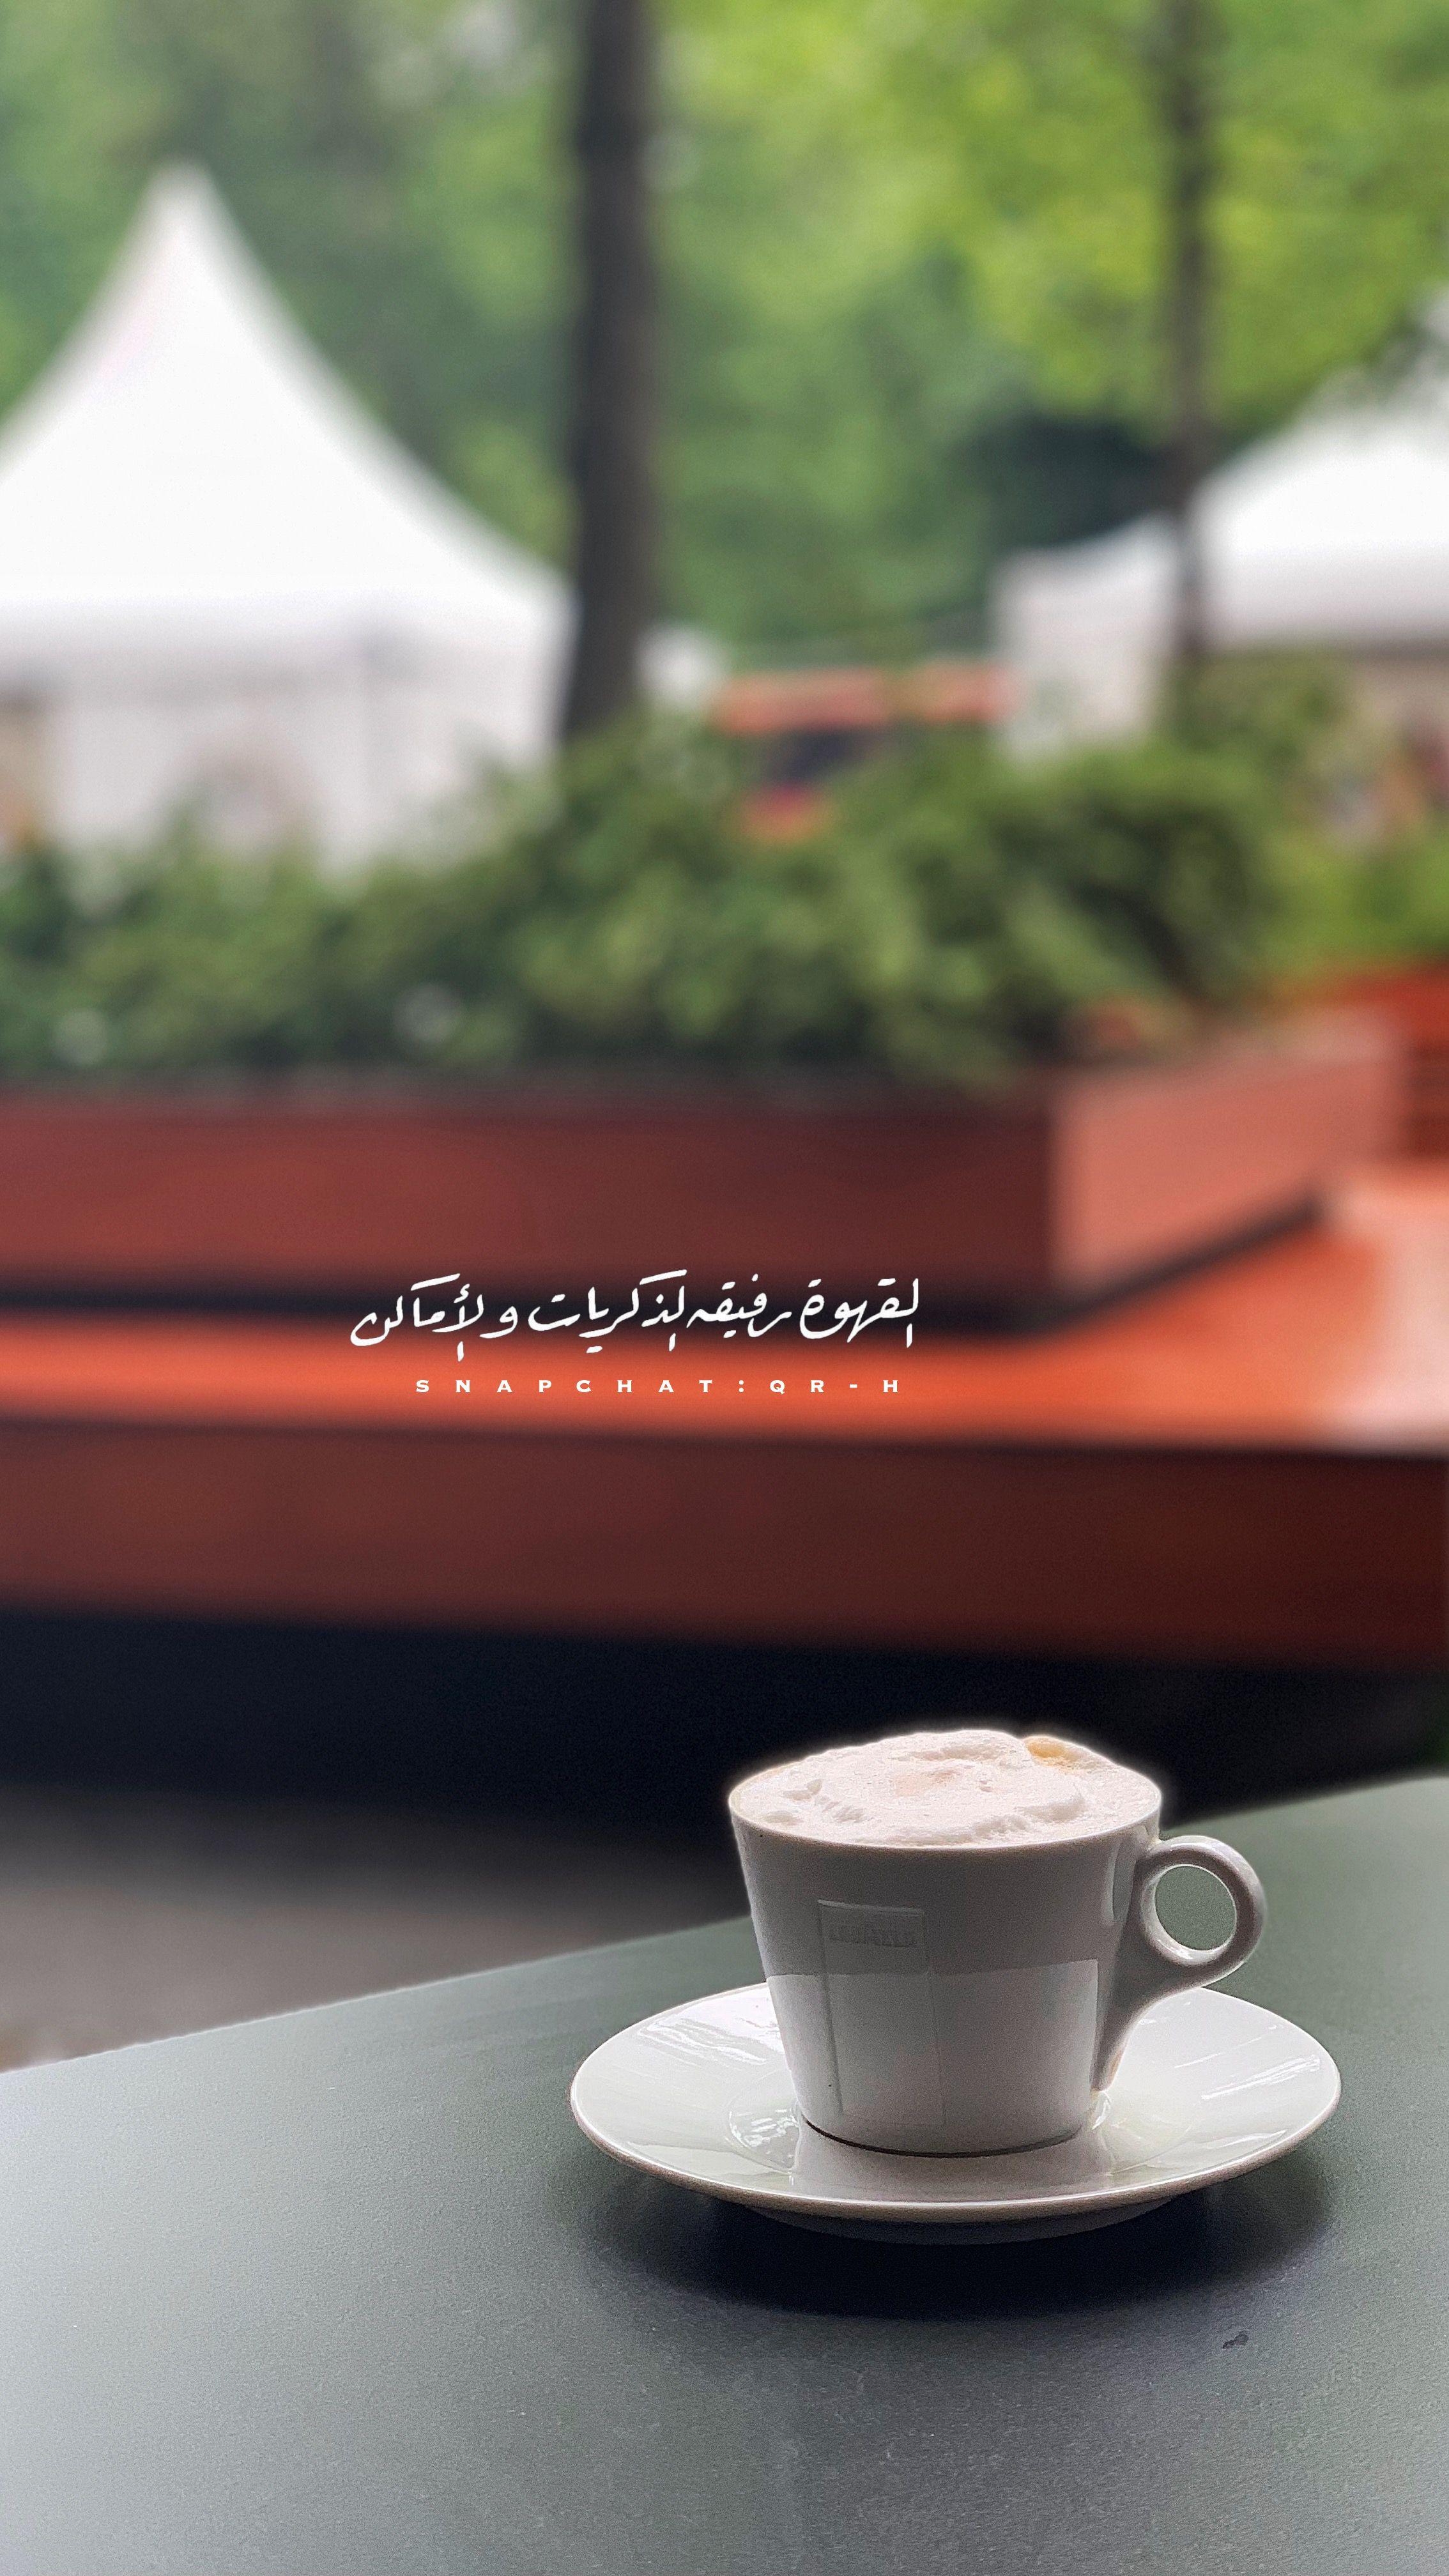 Pin By Suhad Al Amour On اقتباسات Beautiful Arabic Words Pop Art Wallpaper Beautiful Quotes